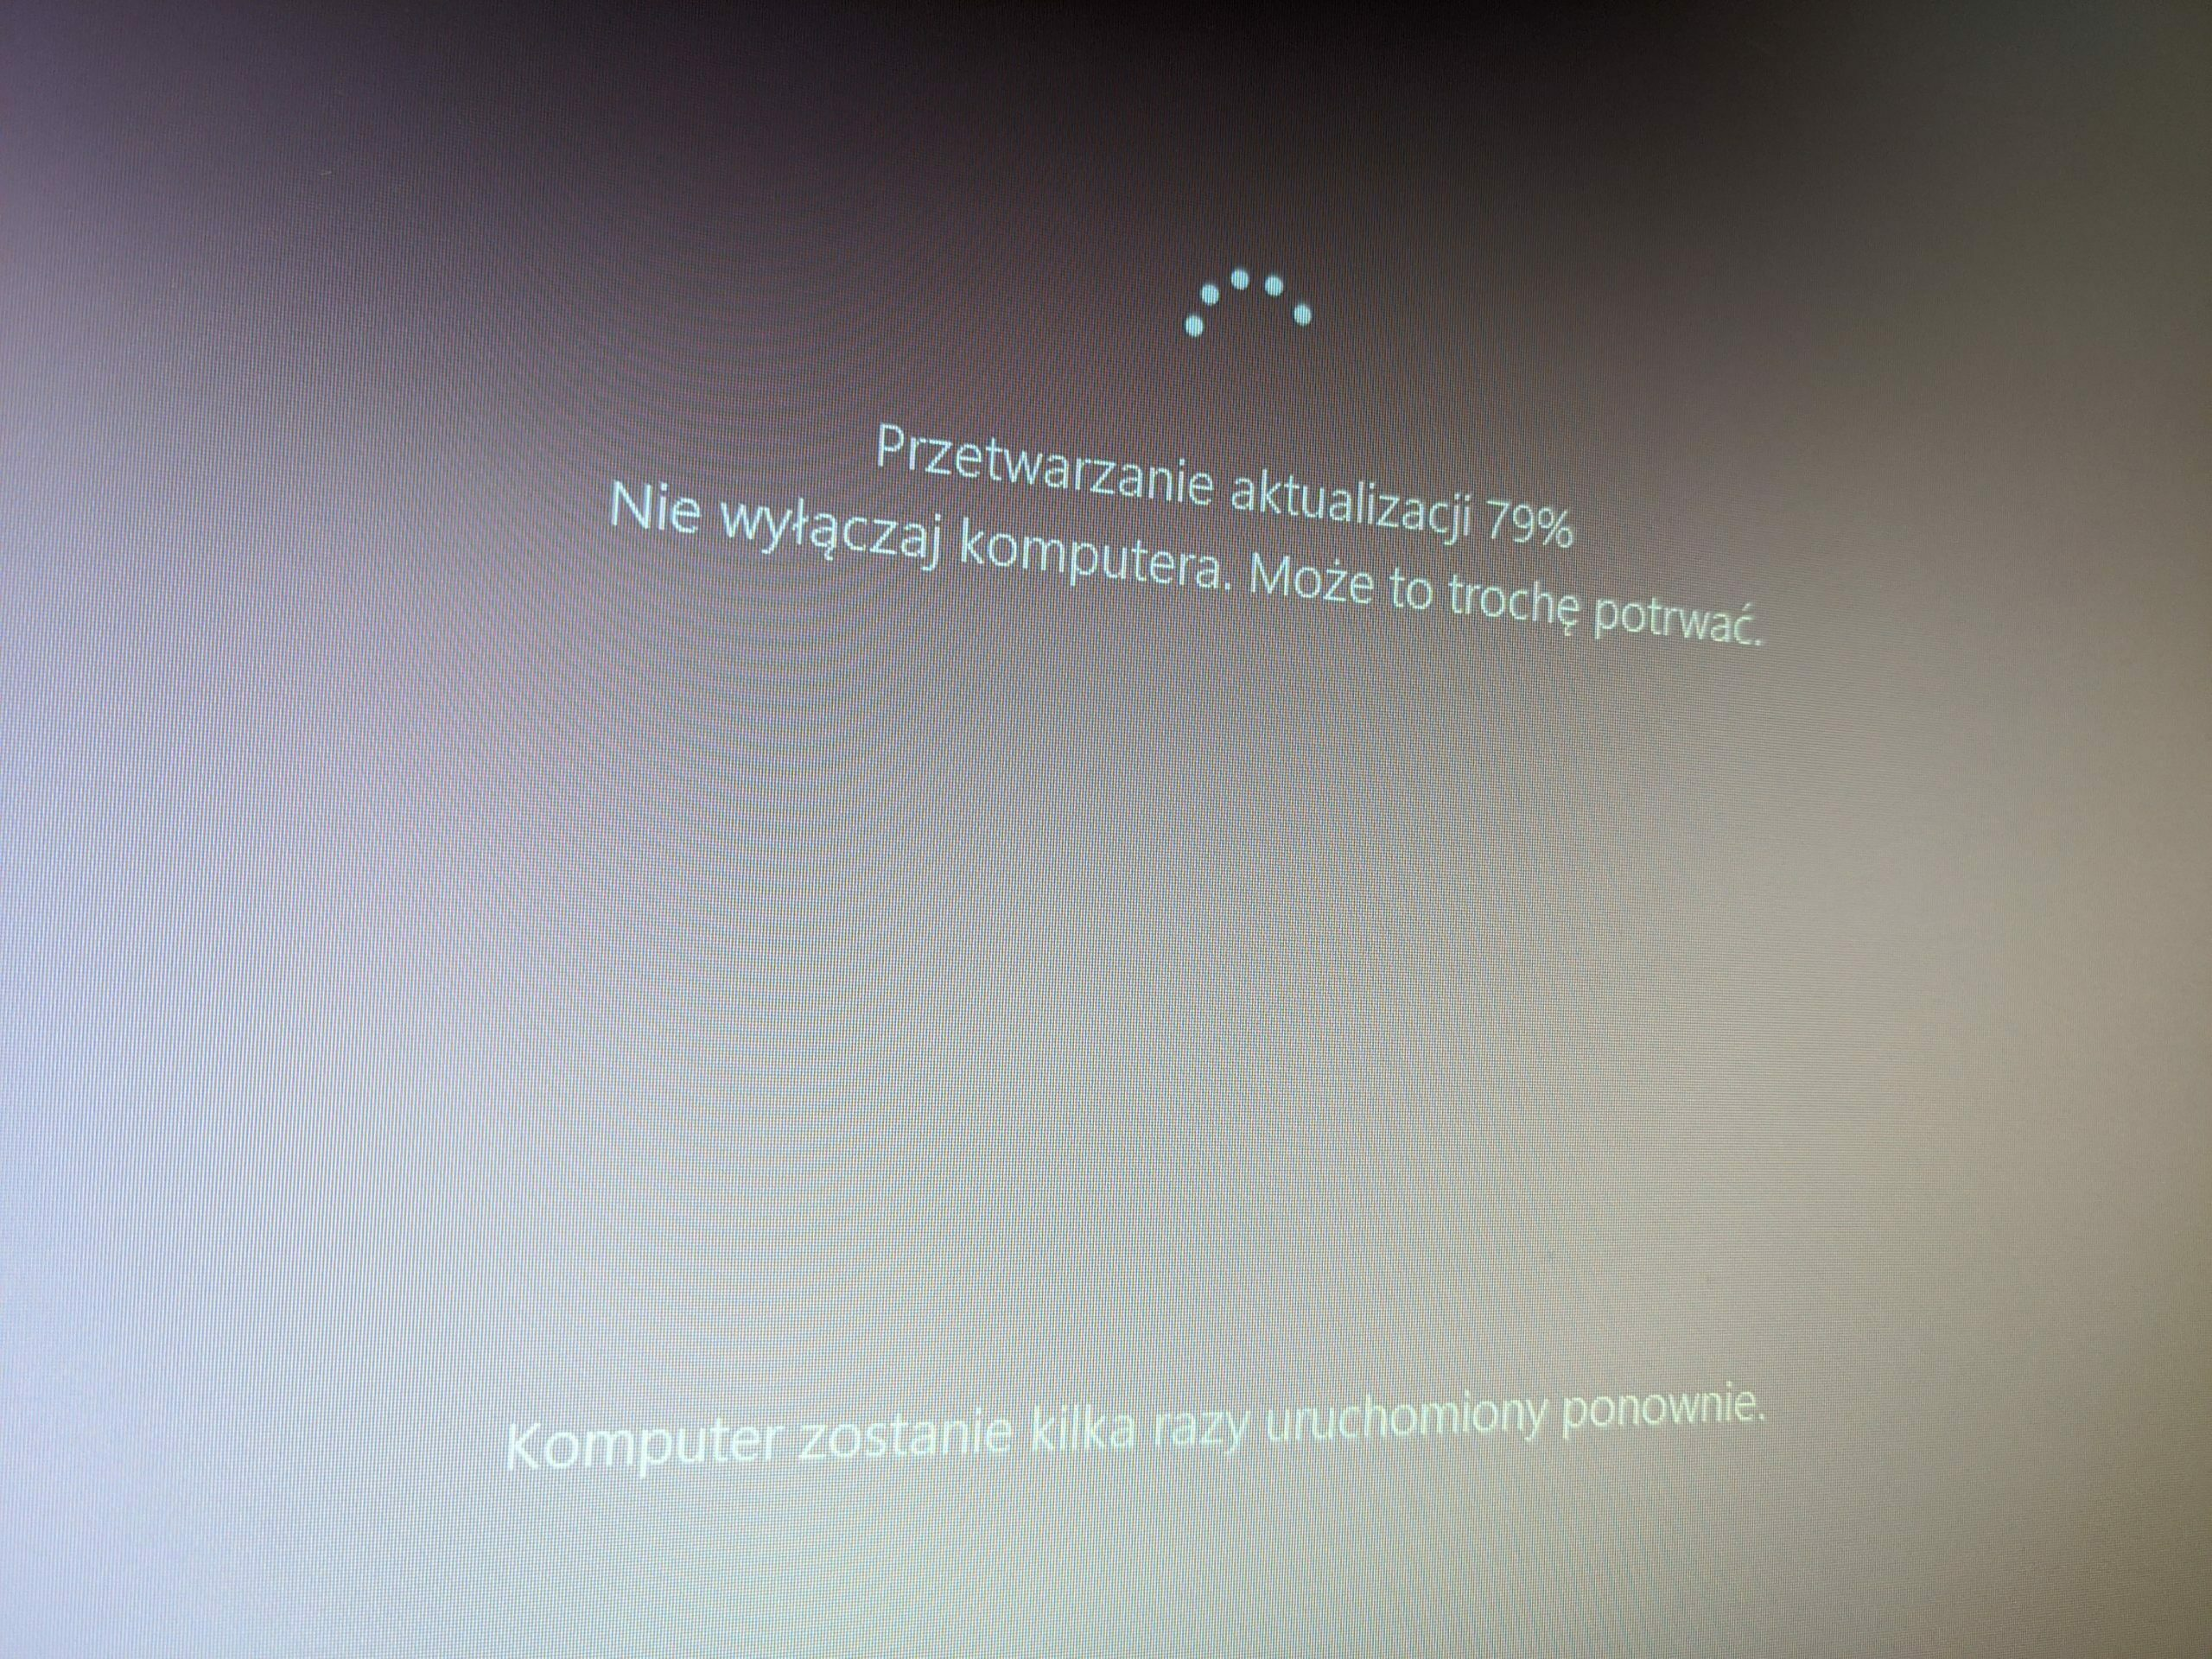 Windows 10 2004 Update #5 - Aktualizacja